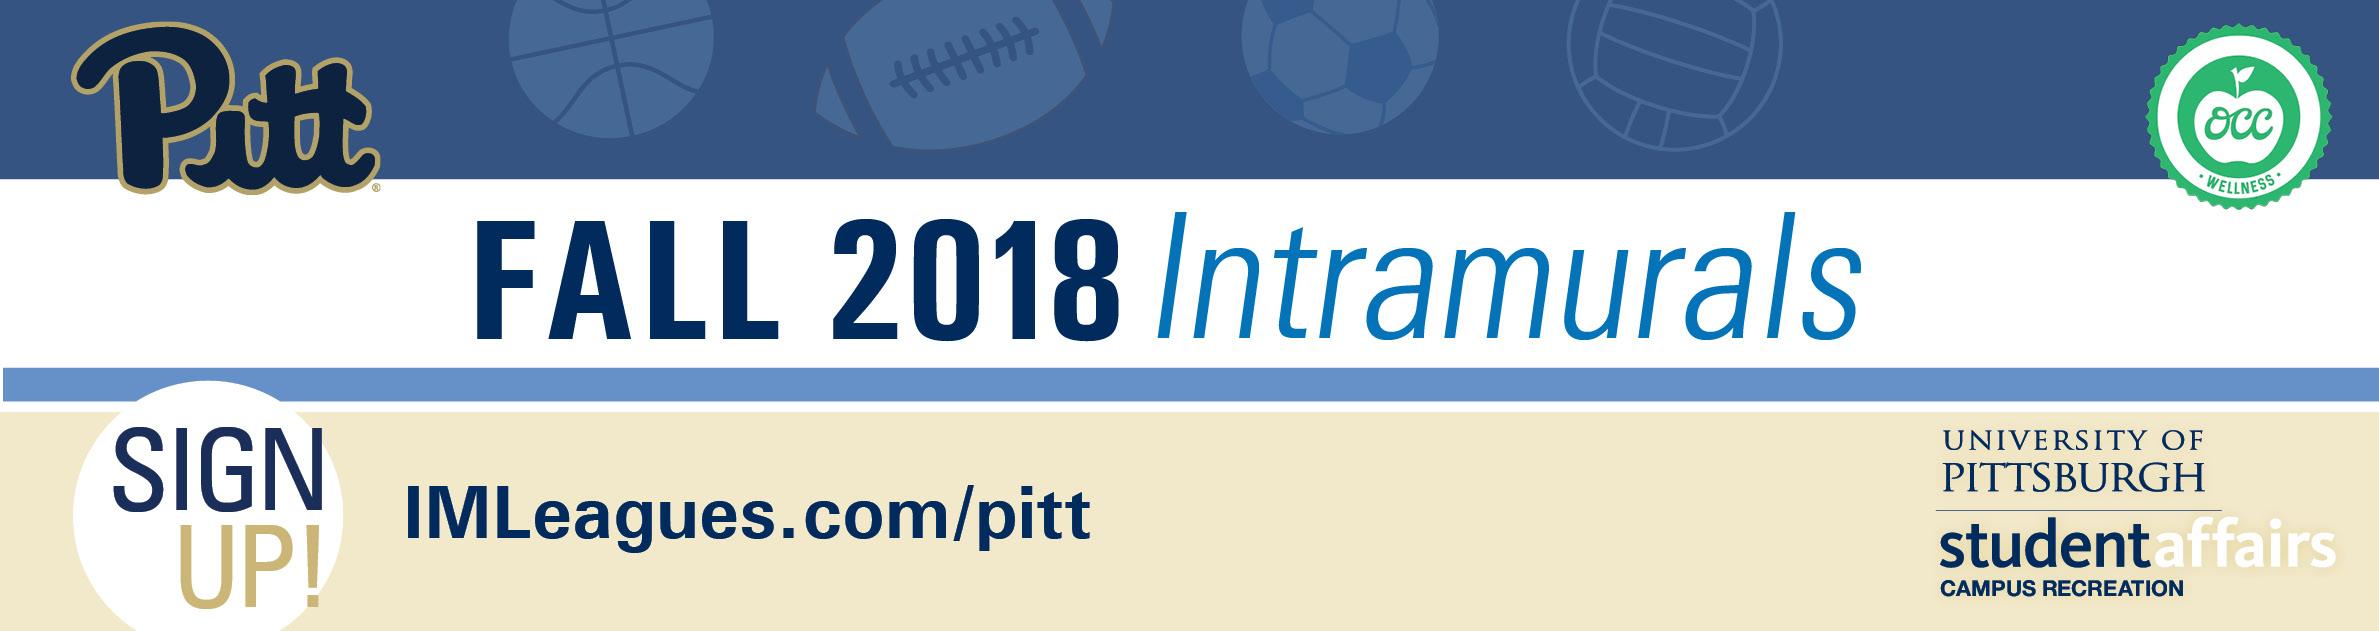 Intramurals_fall2018_slide